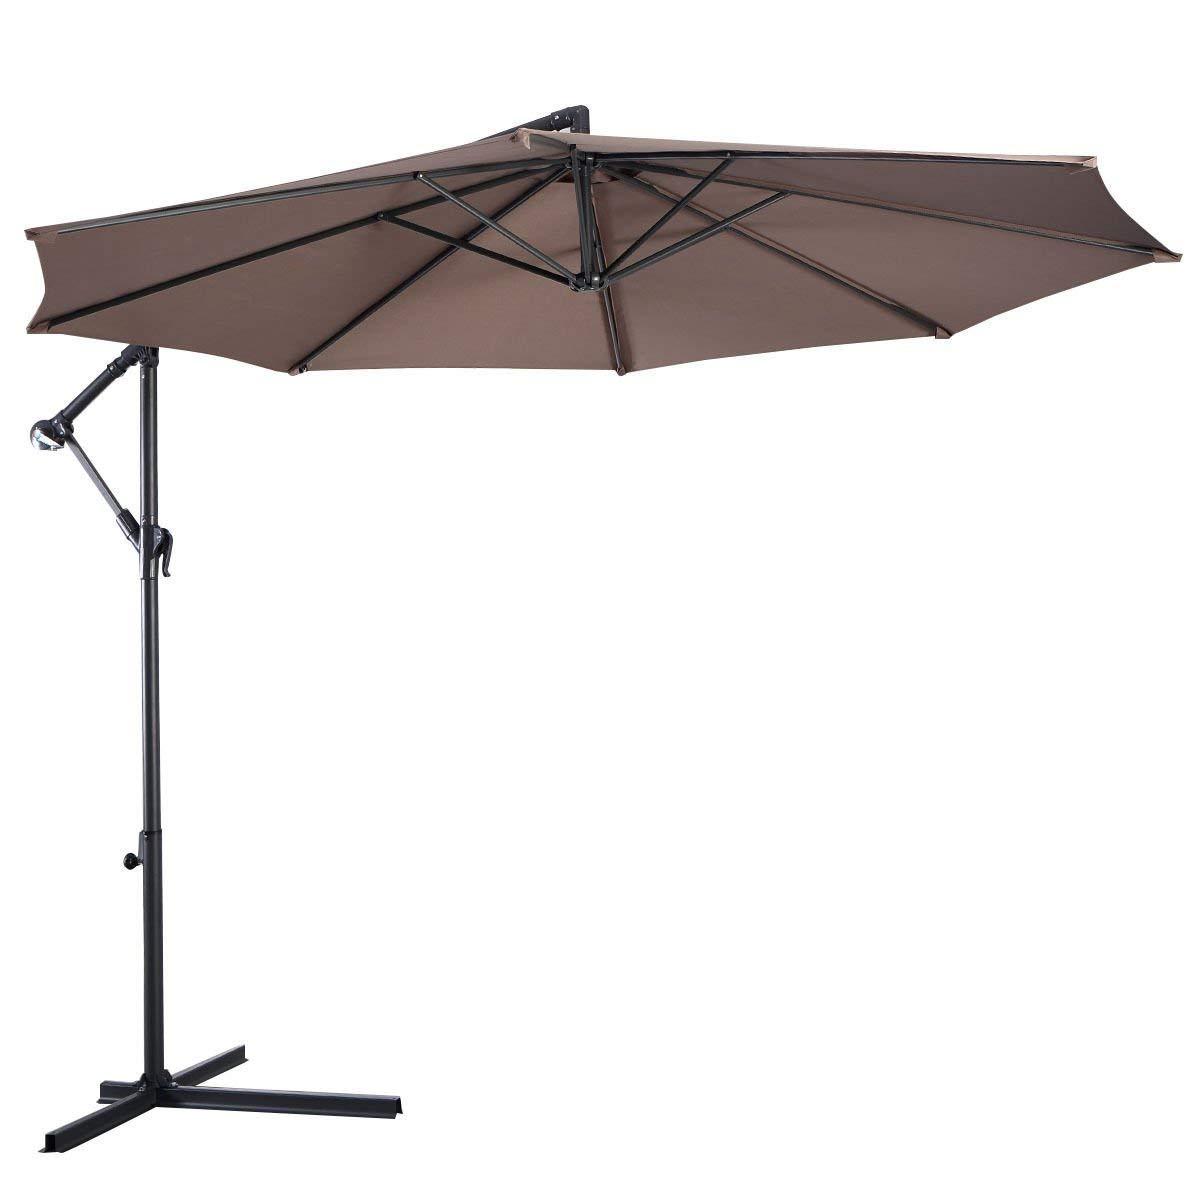 Tangkula Patio Umbrella 10ft Outdoor Sun Shade Umbrella Hanging Offset Crank W/Corss Base 8 Rips Steel Sturdy Frame Table Umbrella for Garden Pool Deck Market Umbrella (Tan)